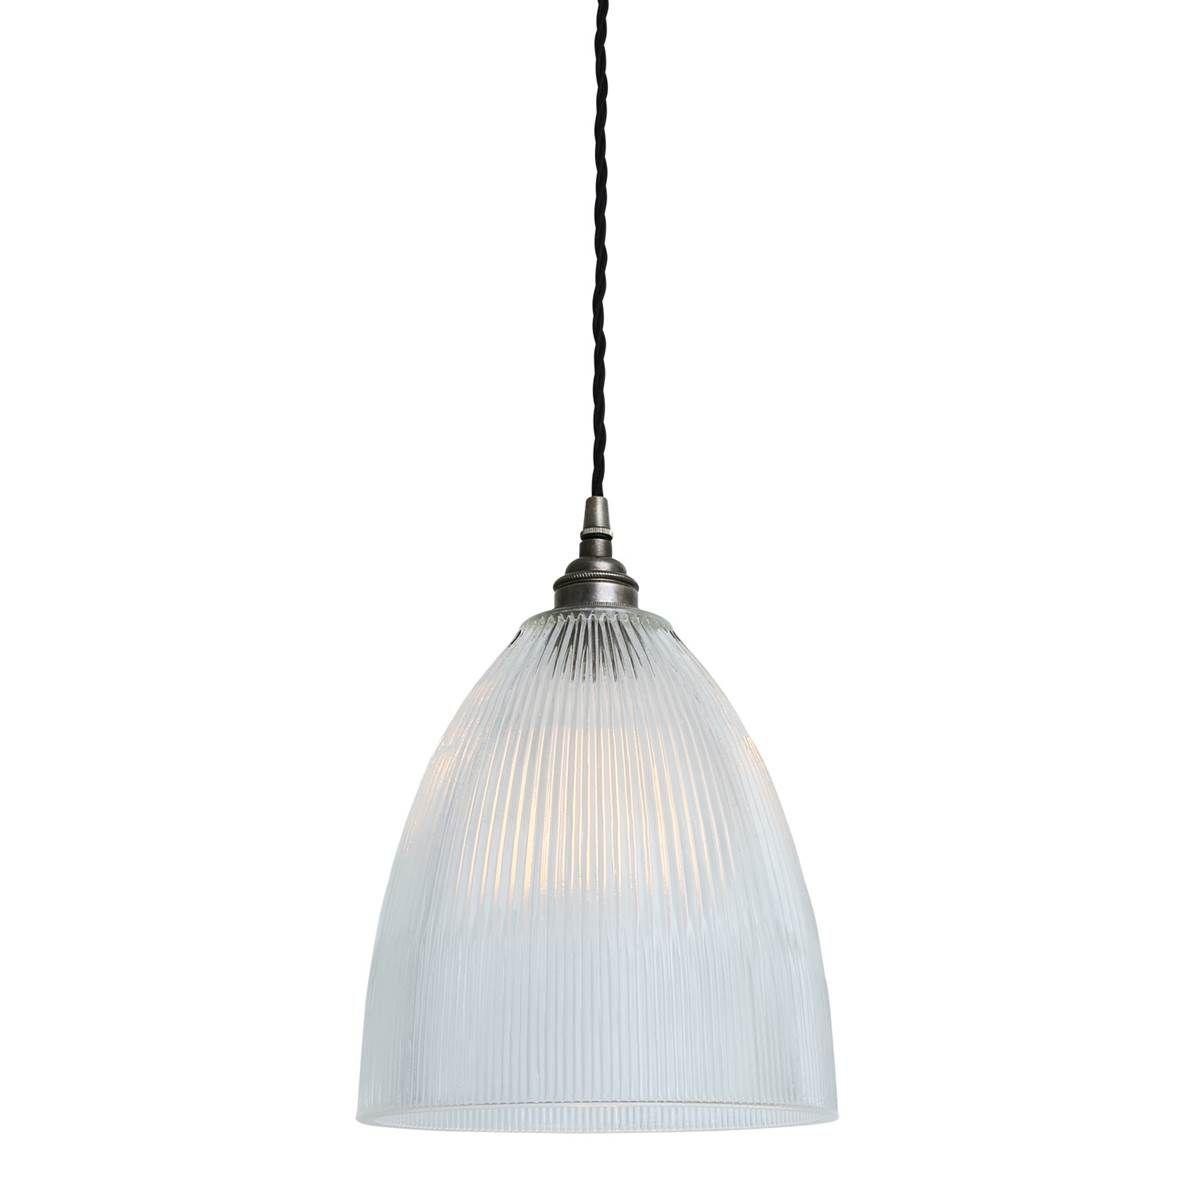 Edwardian hallway lighting  Show details for Corvera pendant light  Kartano valaisimet